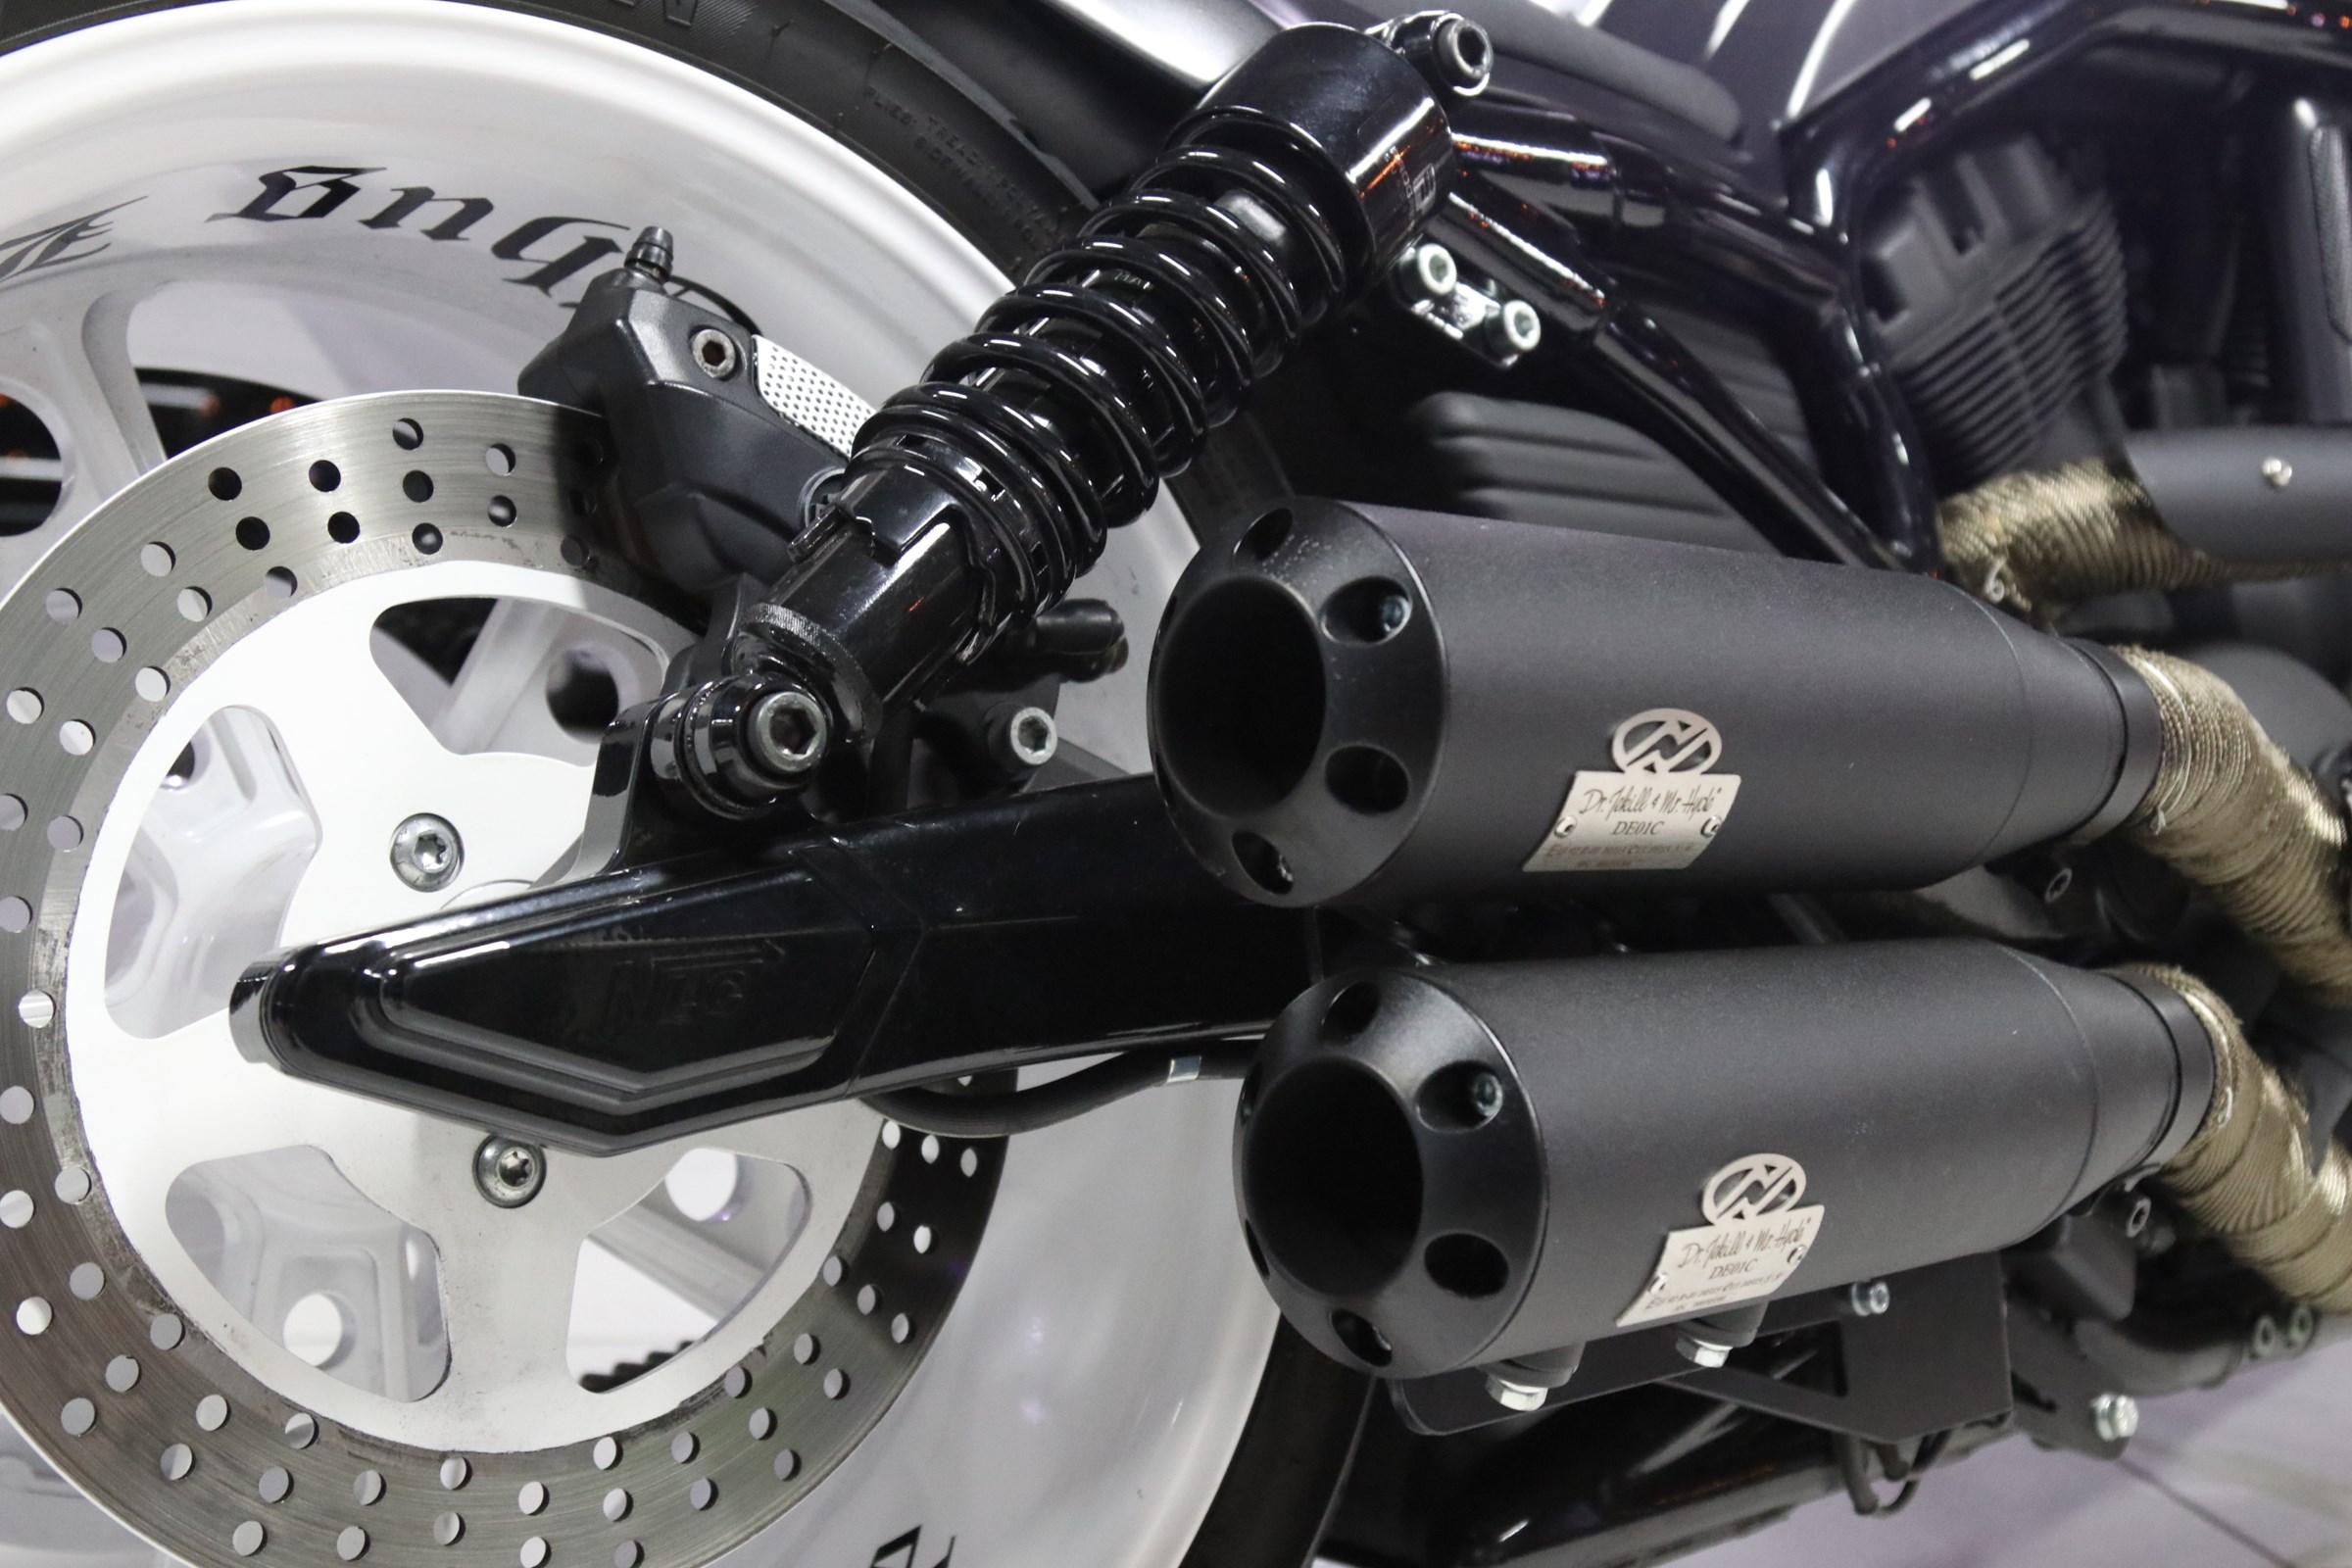 Harley-Davidson VRSCDX 1130 V-Rod Night Road Special